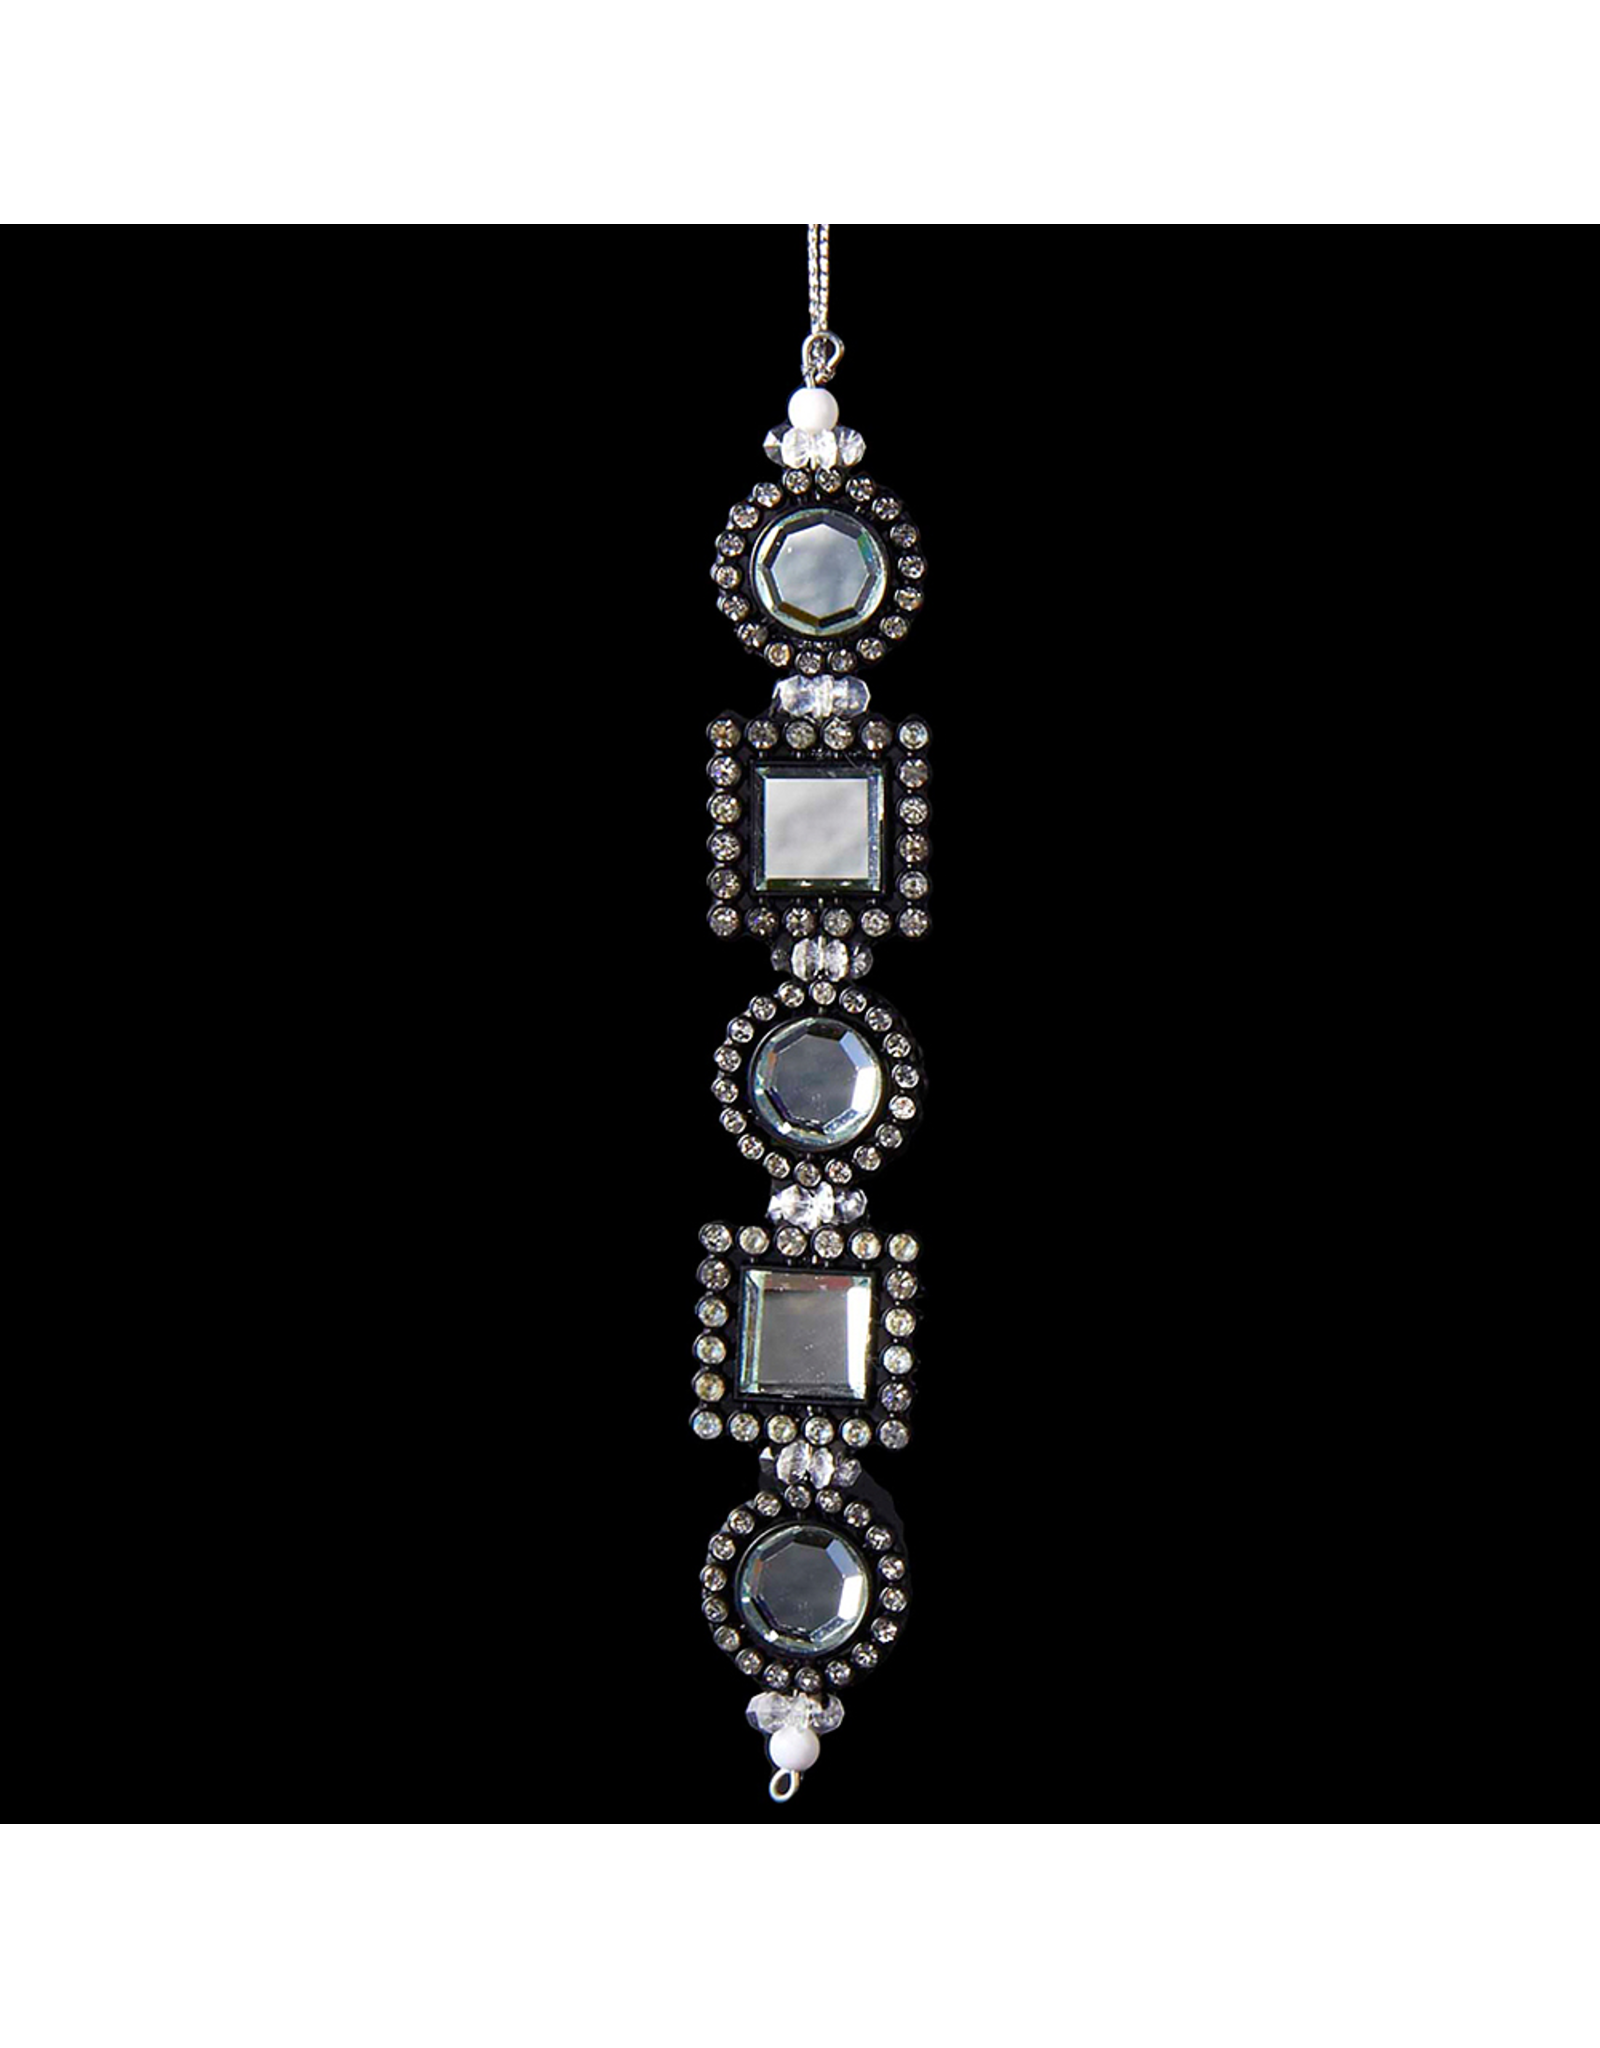 Kurt Adler Black and Silver Gemstone Ornament Square Round -B